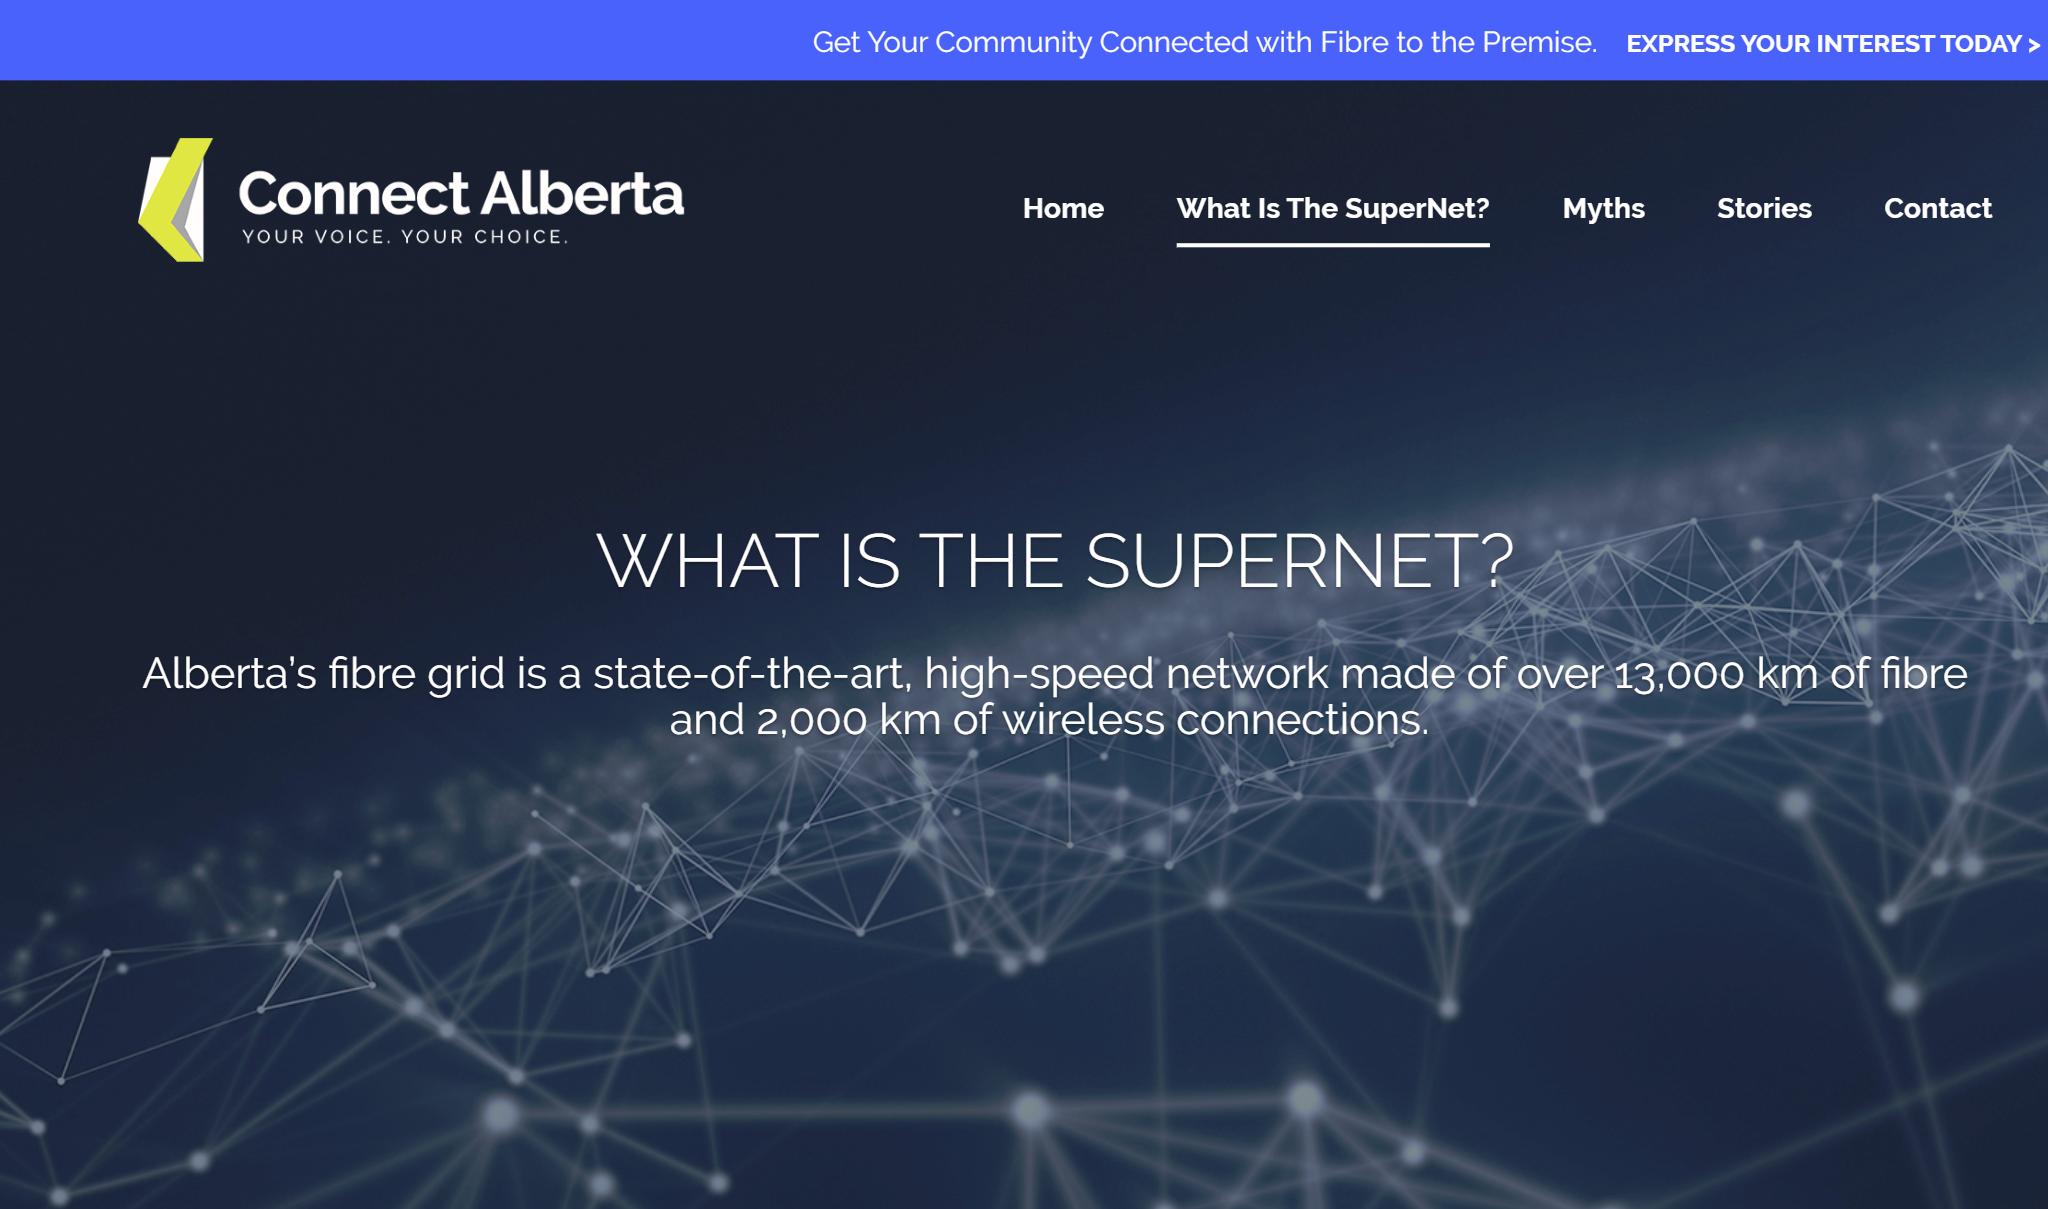 Connect Alberta